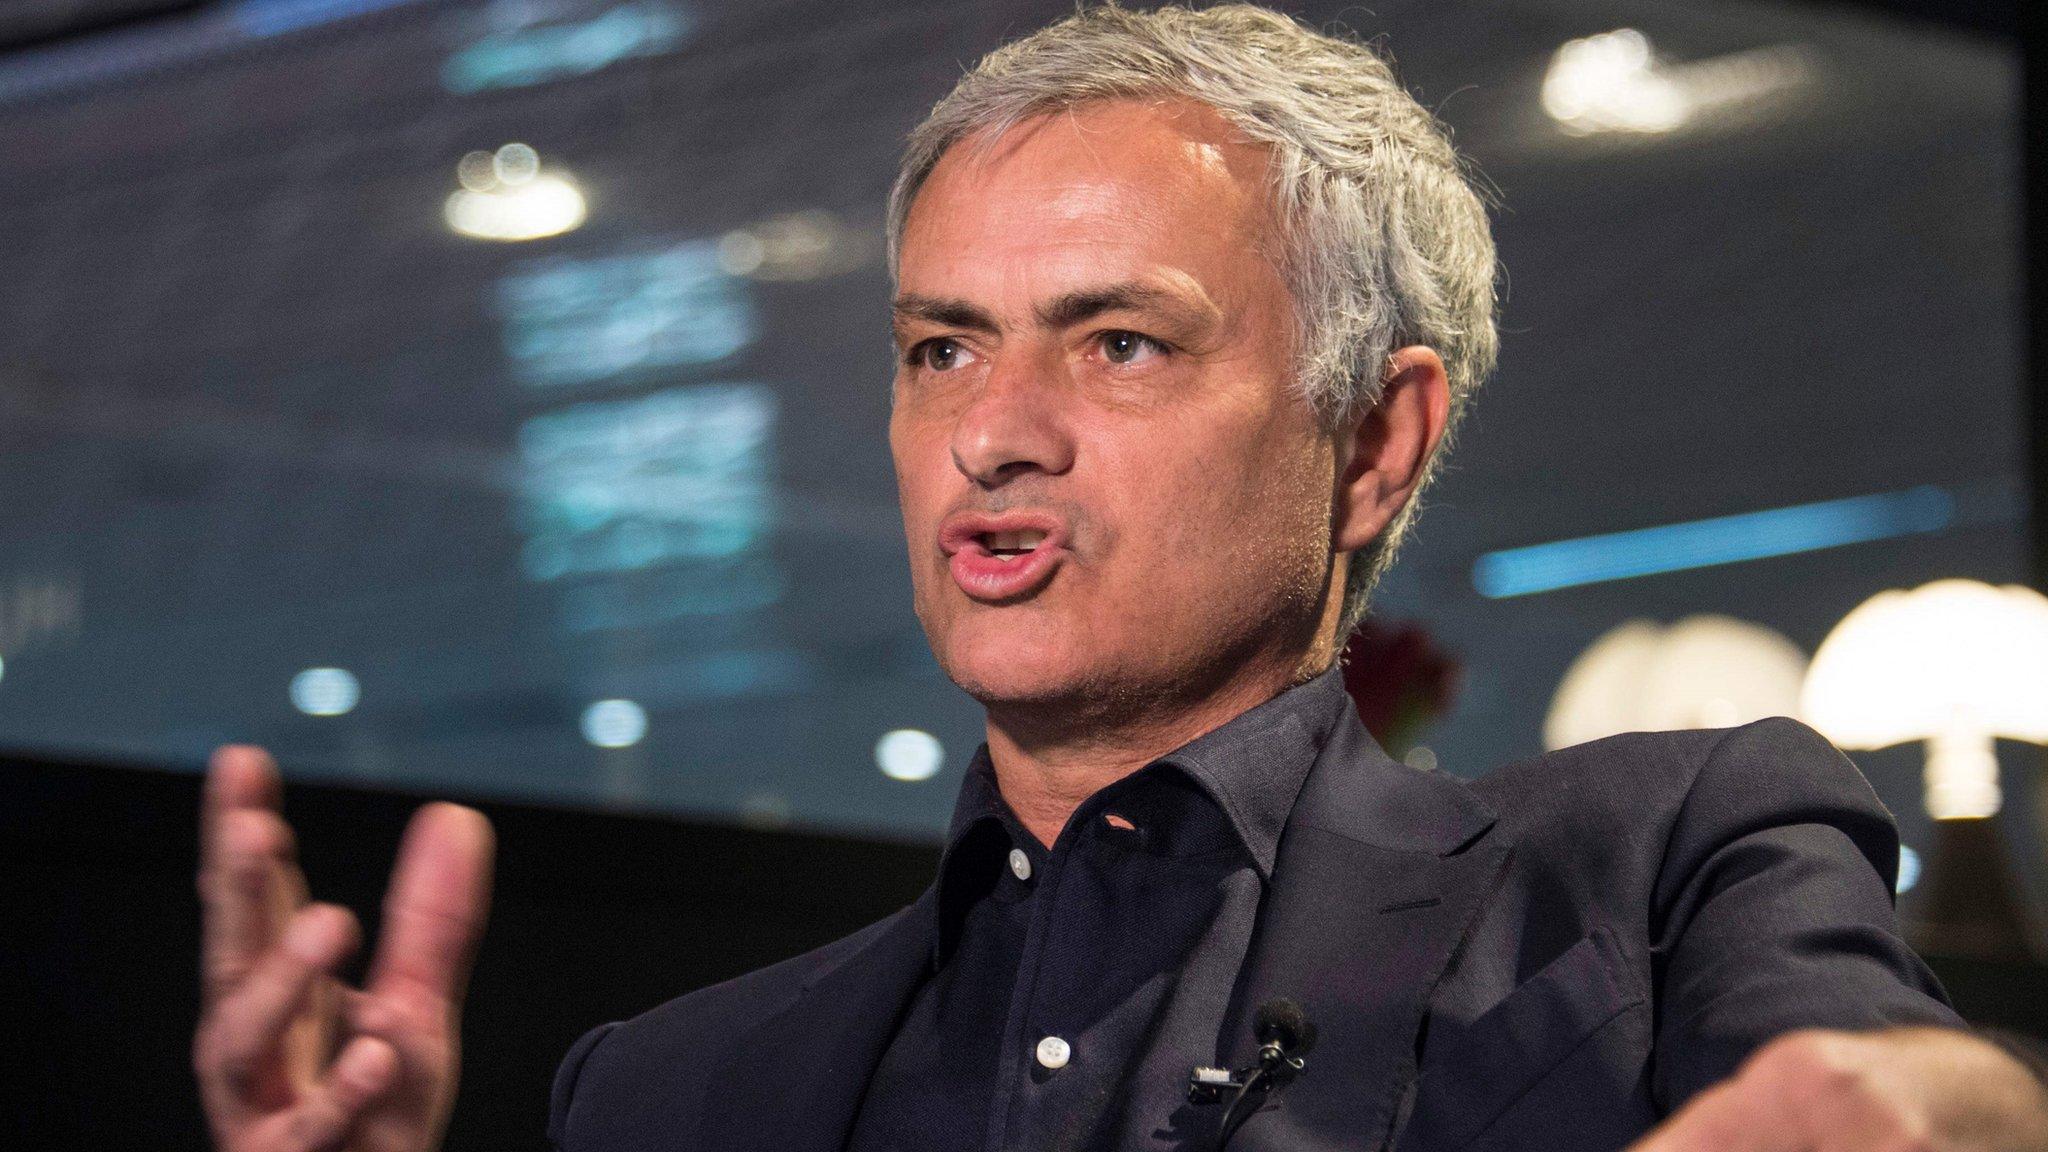 Jose Mourinho: Ex-Man Utd boss eyes summer return to management